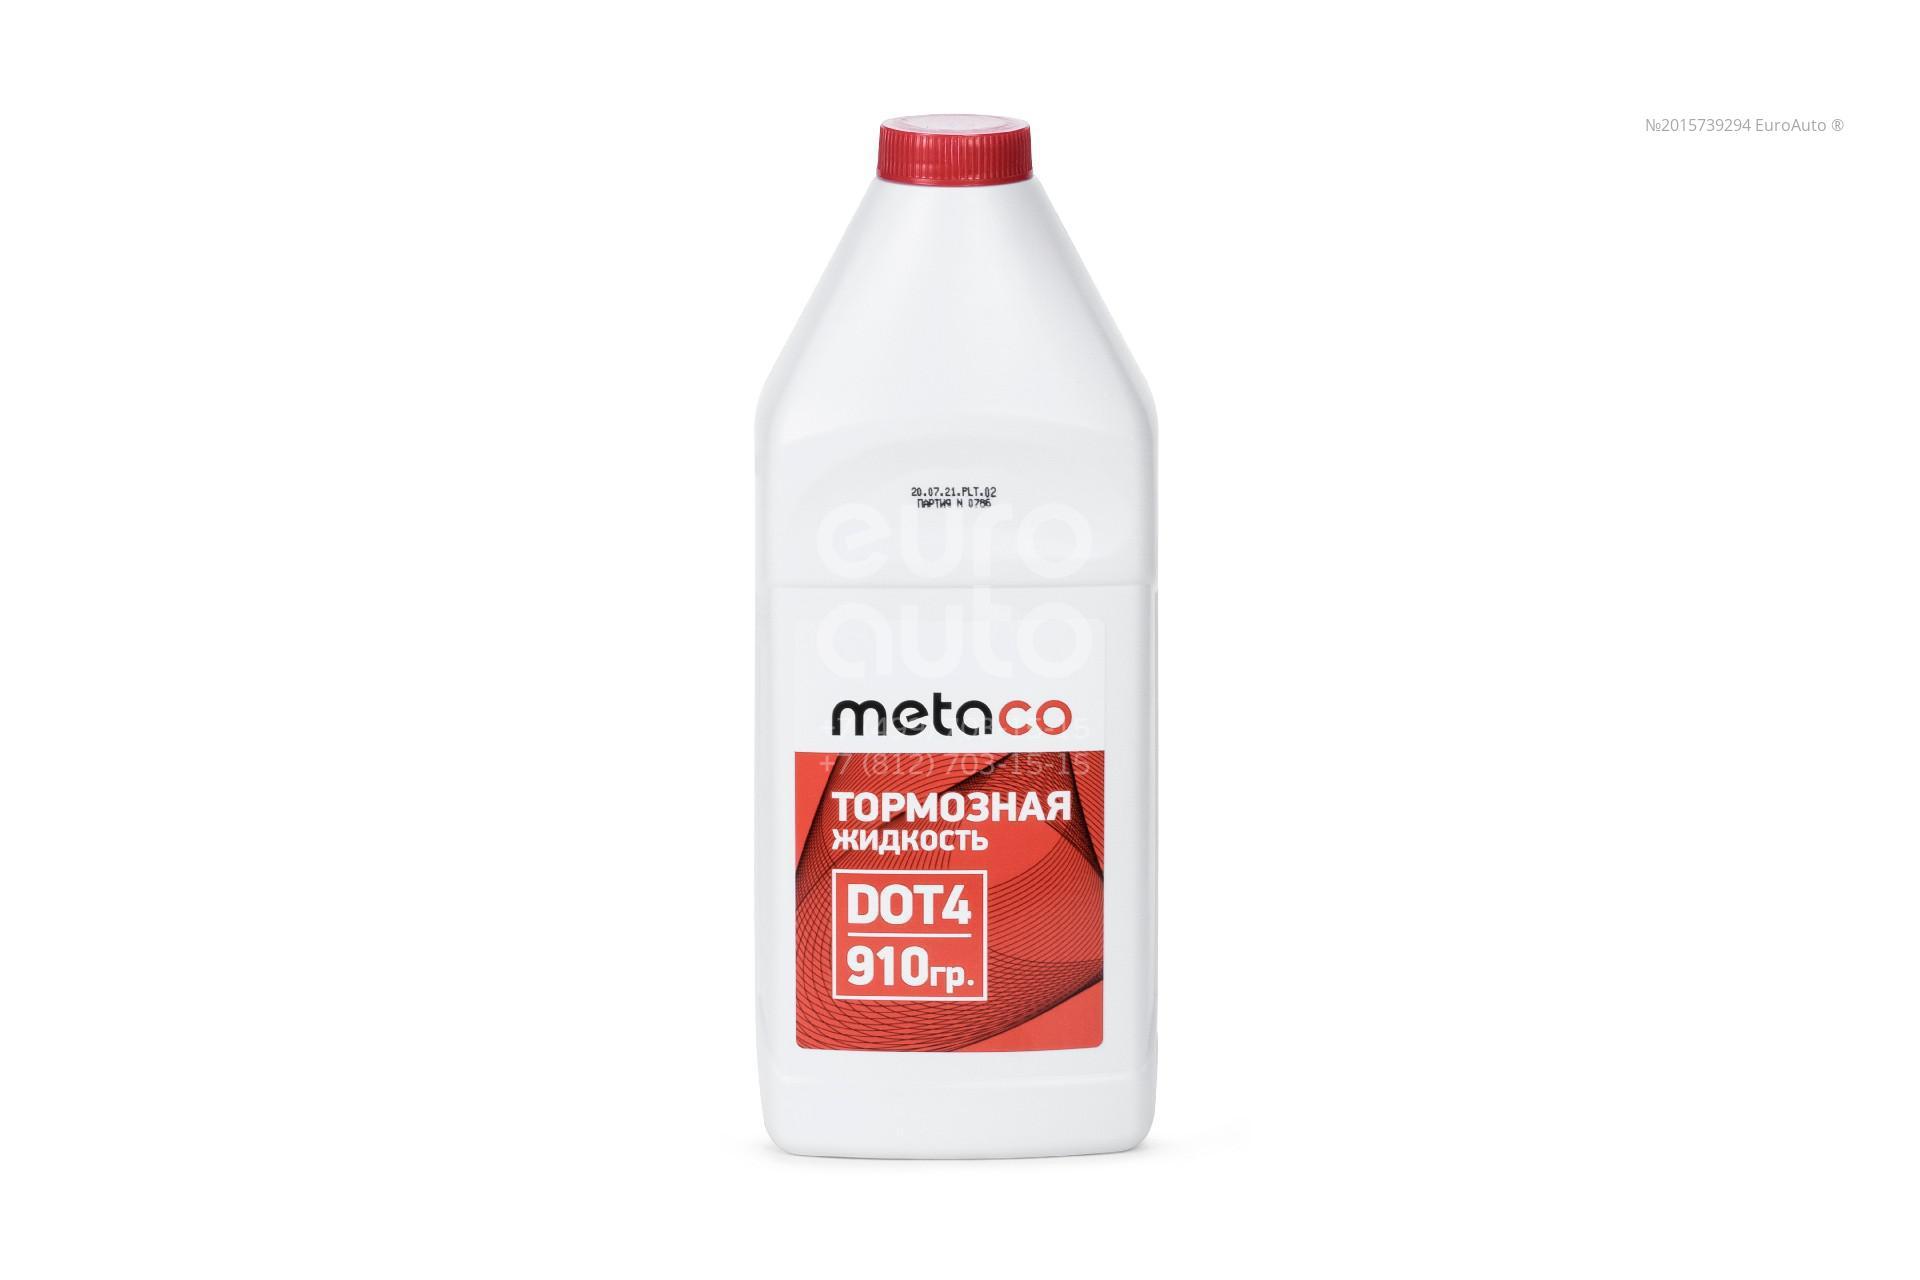 Жидкость тормозная DOT4 1L / FENOX, METACO 910 ГР - Фото №1